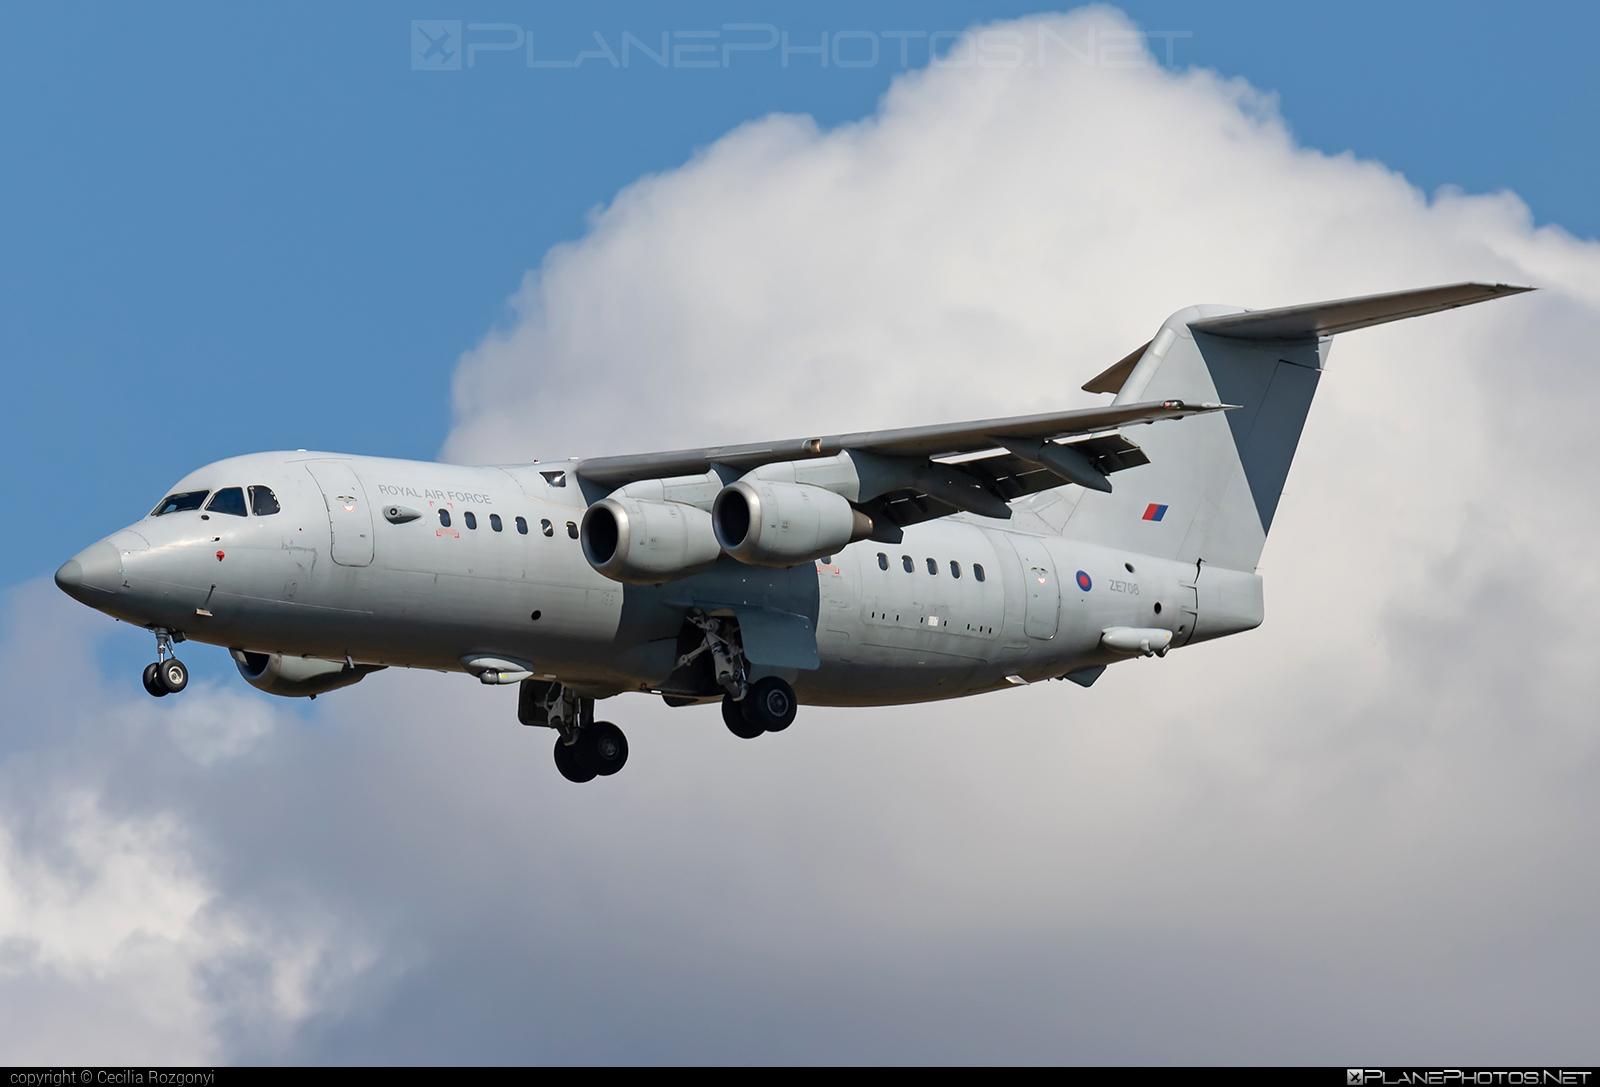 British Aerospace BAe 146-200 - ZE708 operated by Royal Air Force (RAF) #bae146 #bae146200 #britishaerospace #raf #royalairforce